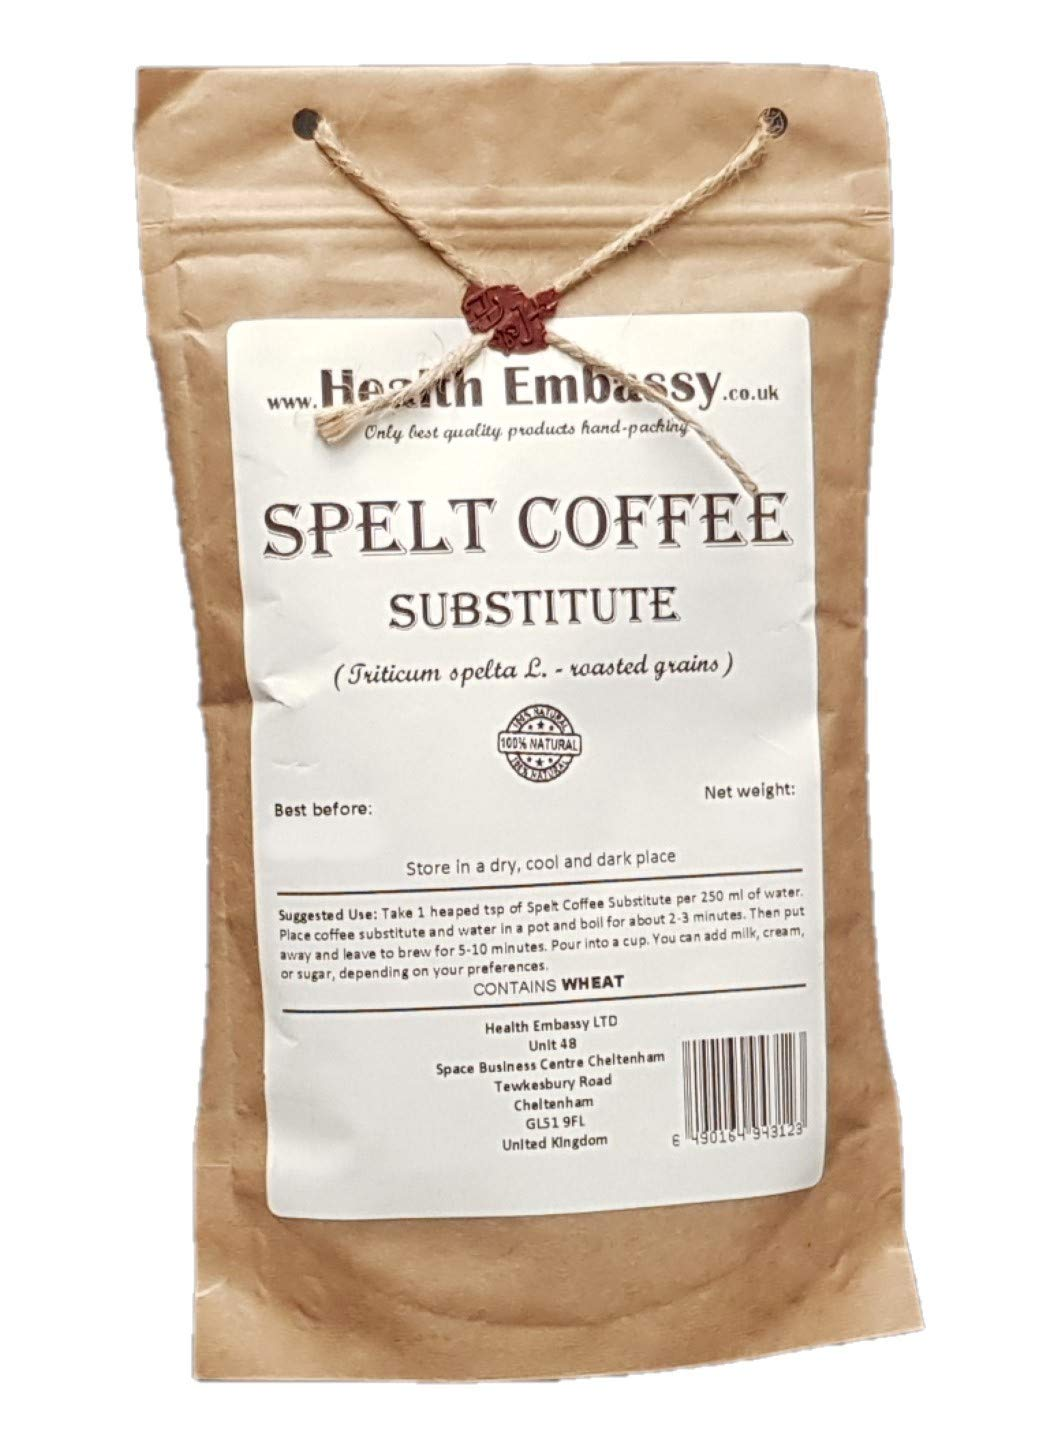 Spelt Coffee (Triticumspelta - roasted grains) - Health Embassy - 100% Natural (100g)